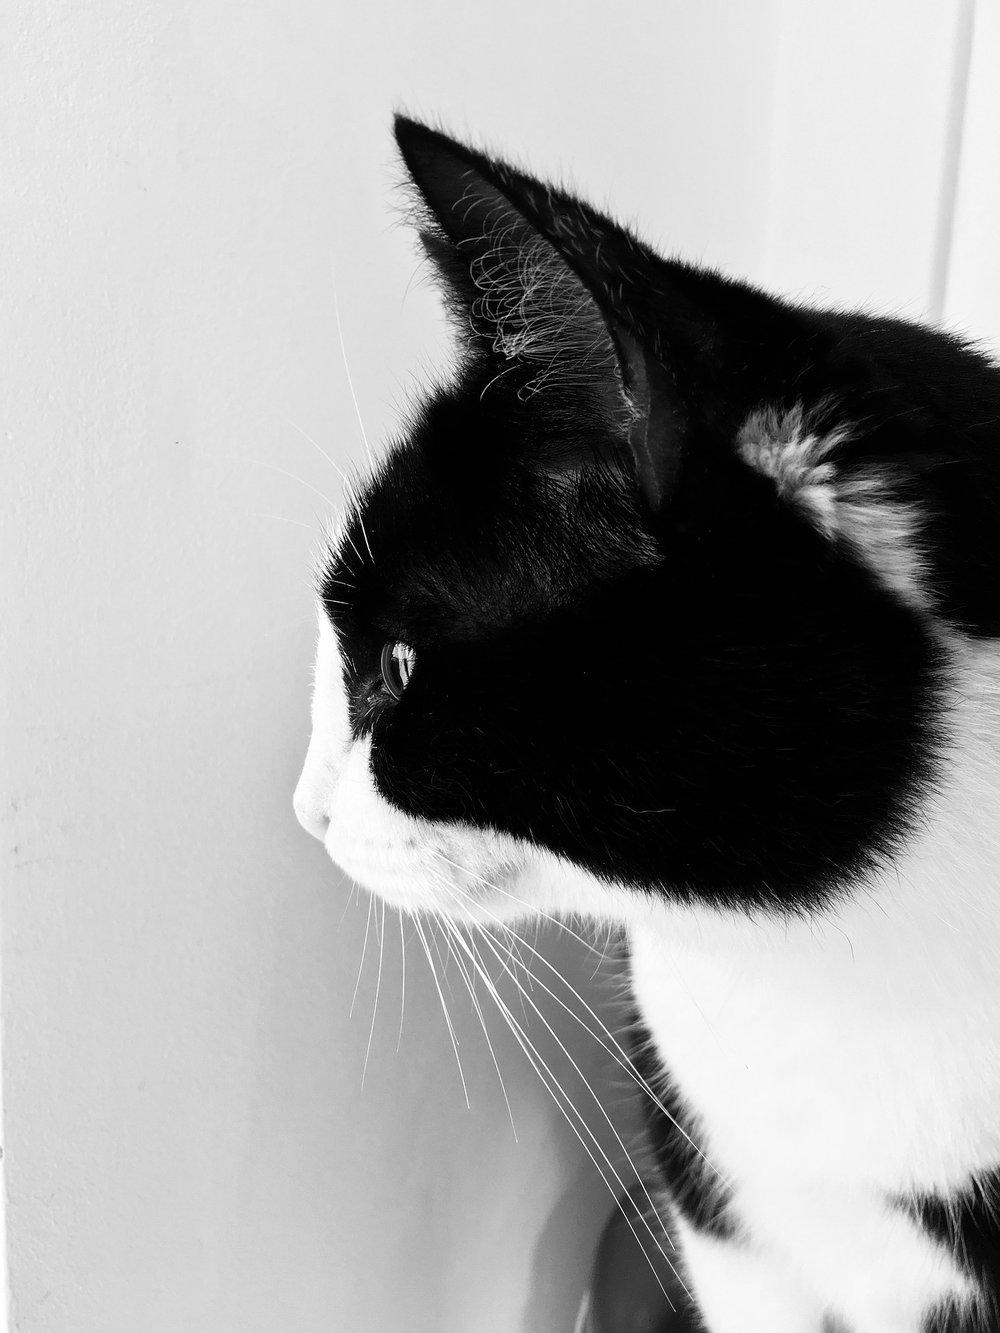 cat-3374409_1920.jpg